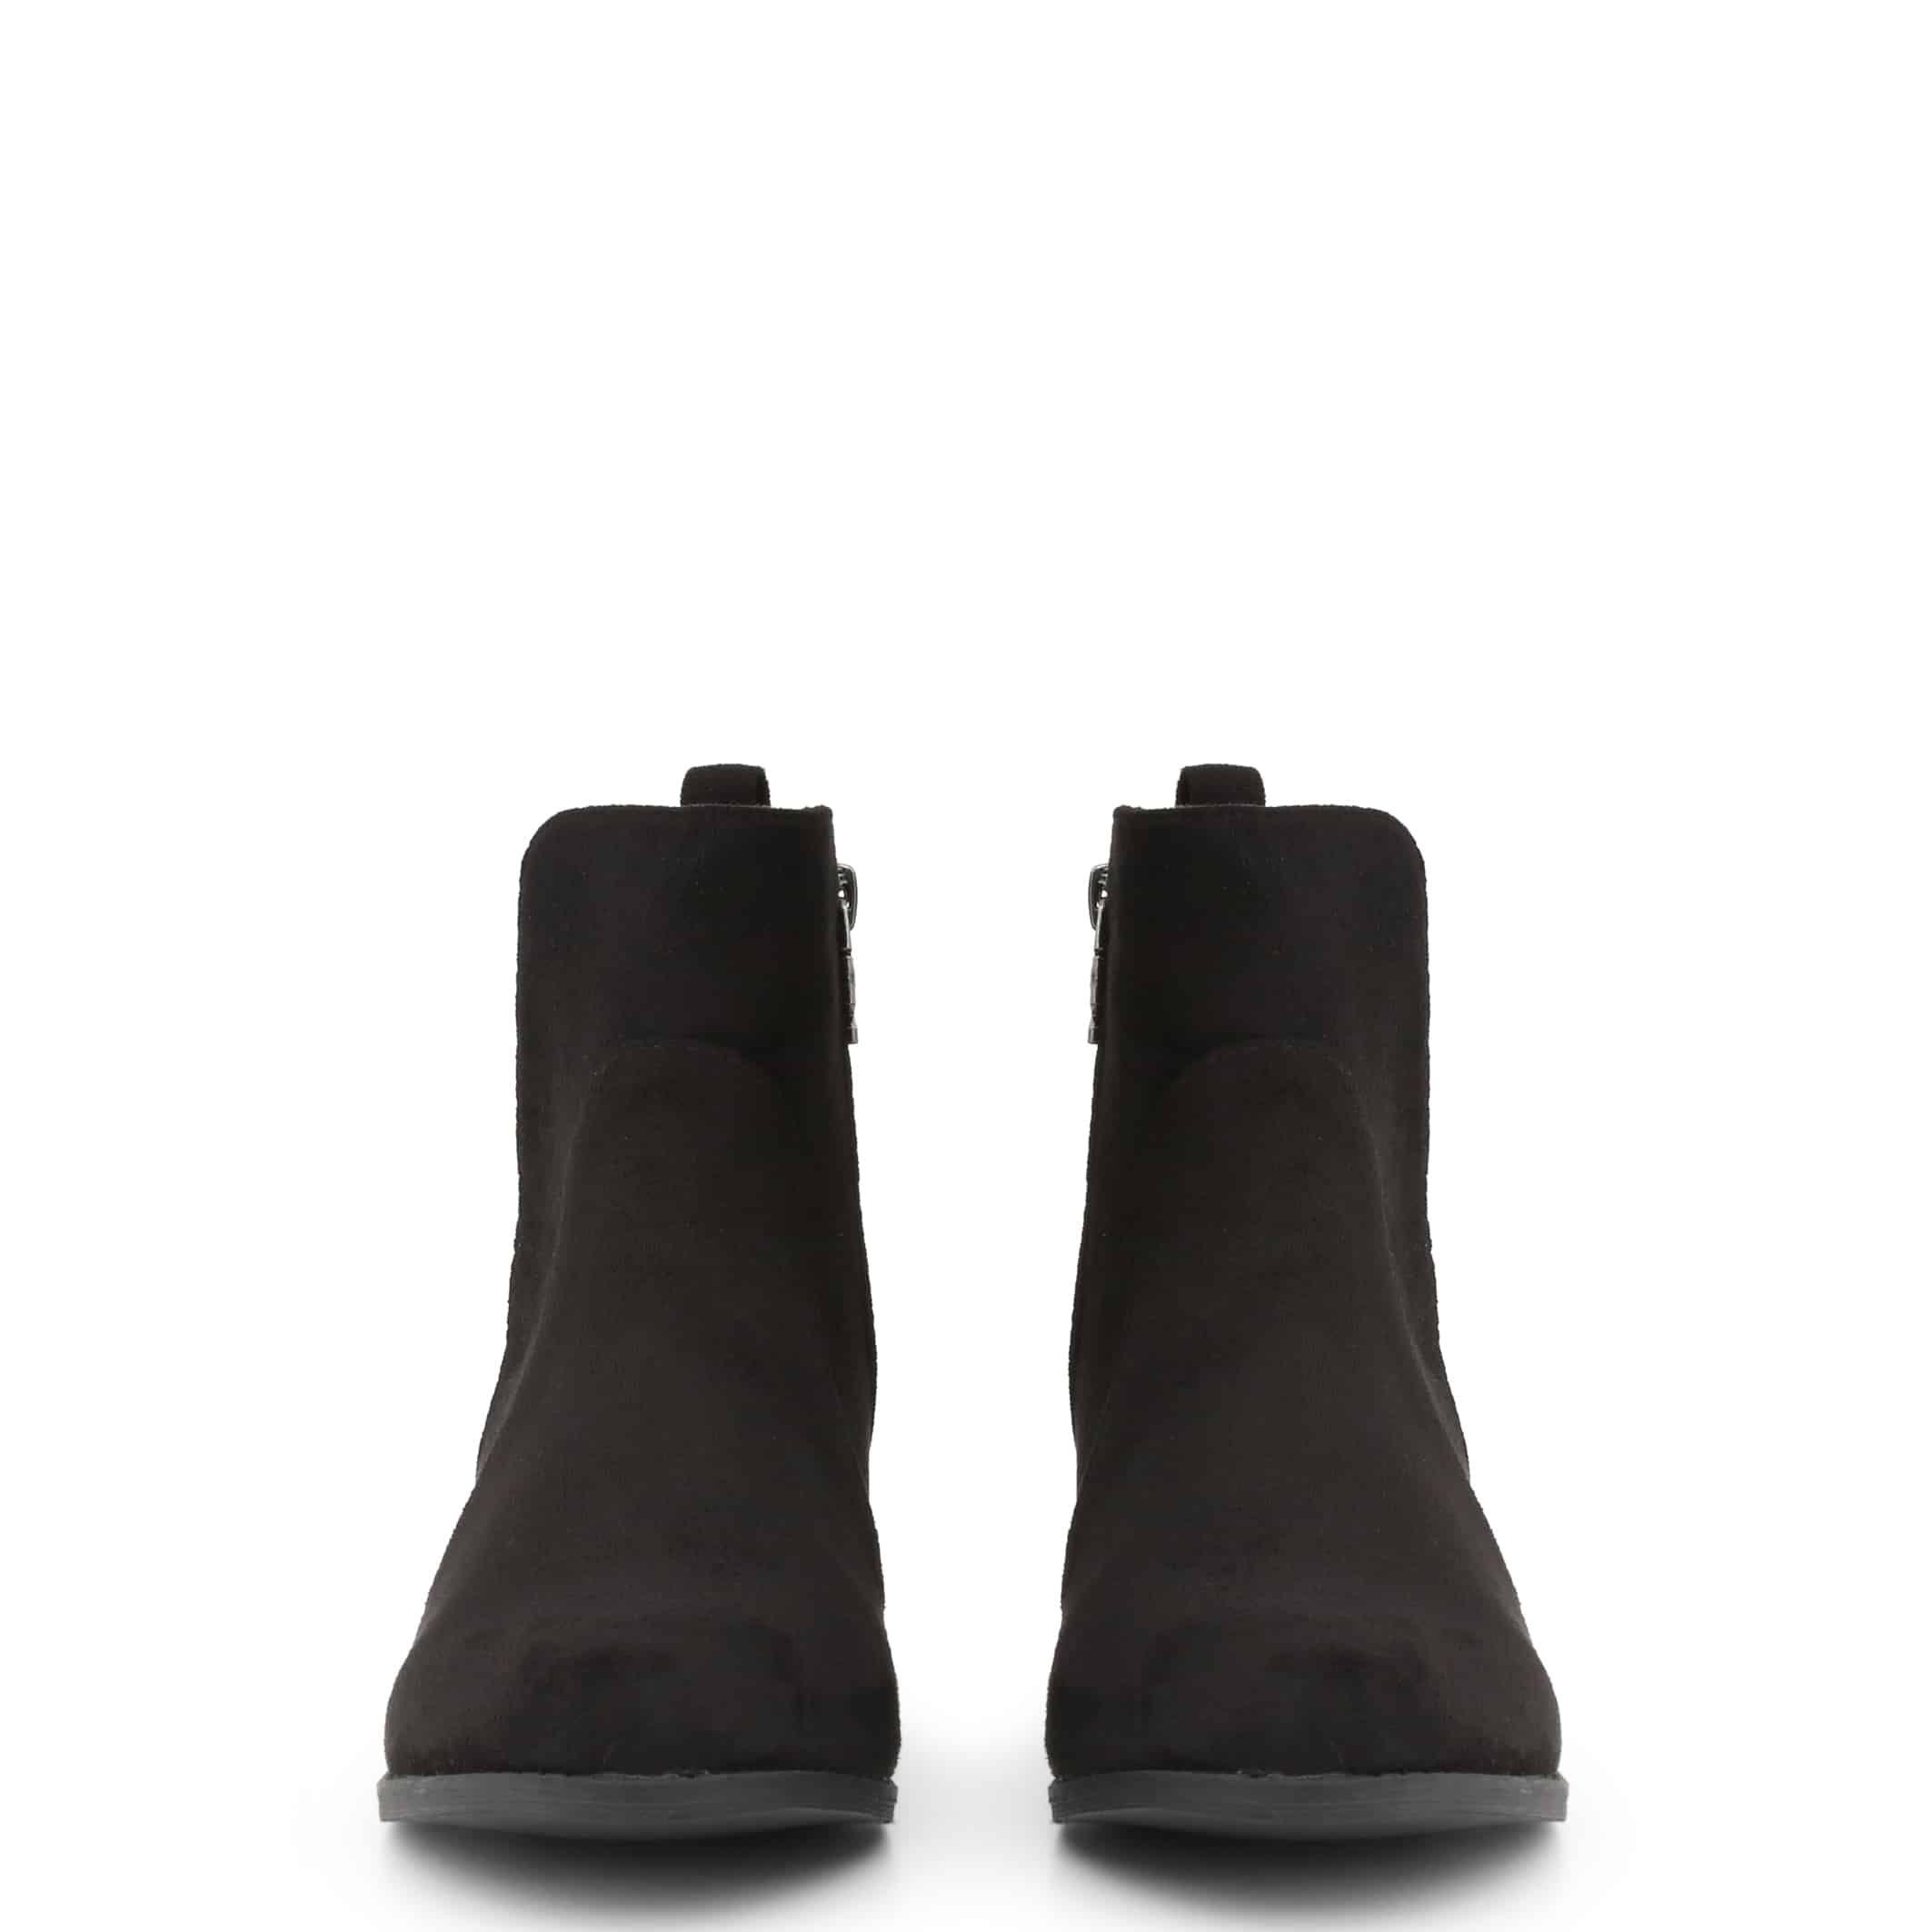 Schuhe Xti – 48606 – Schwarz